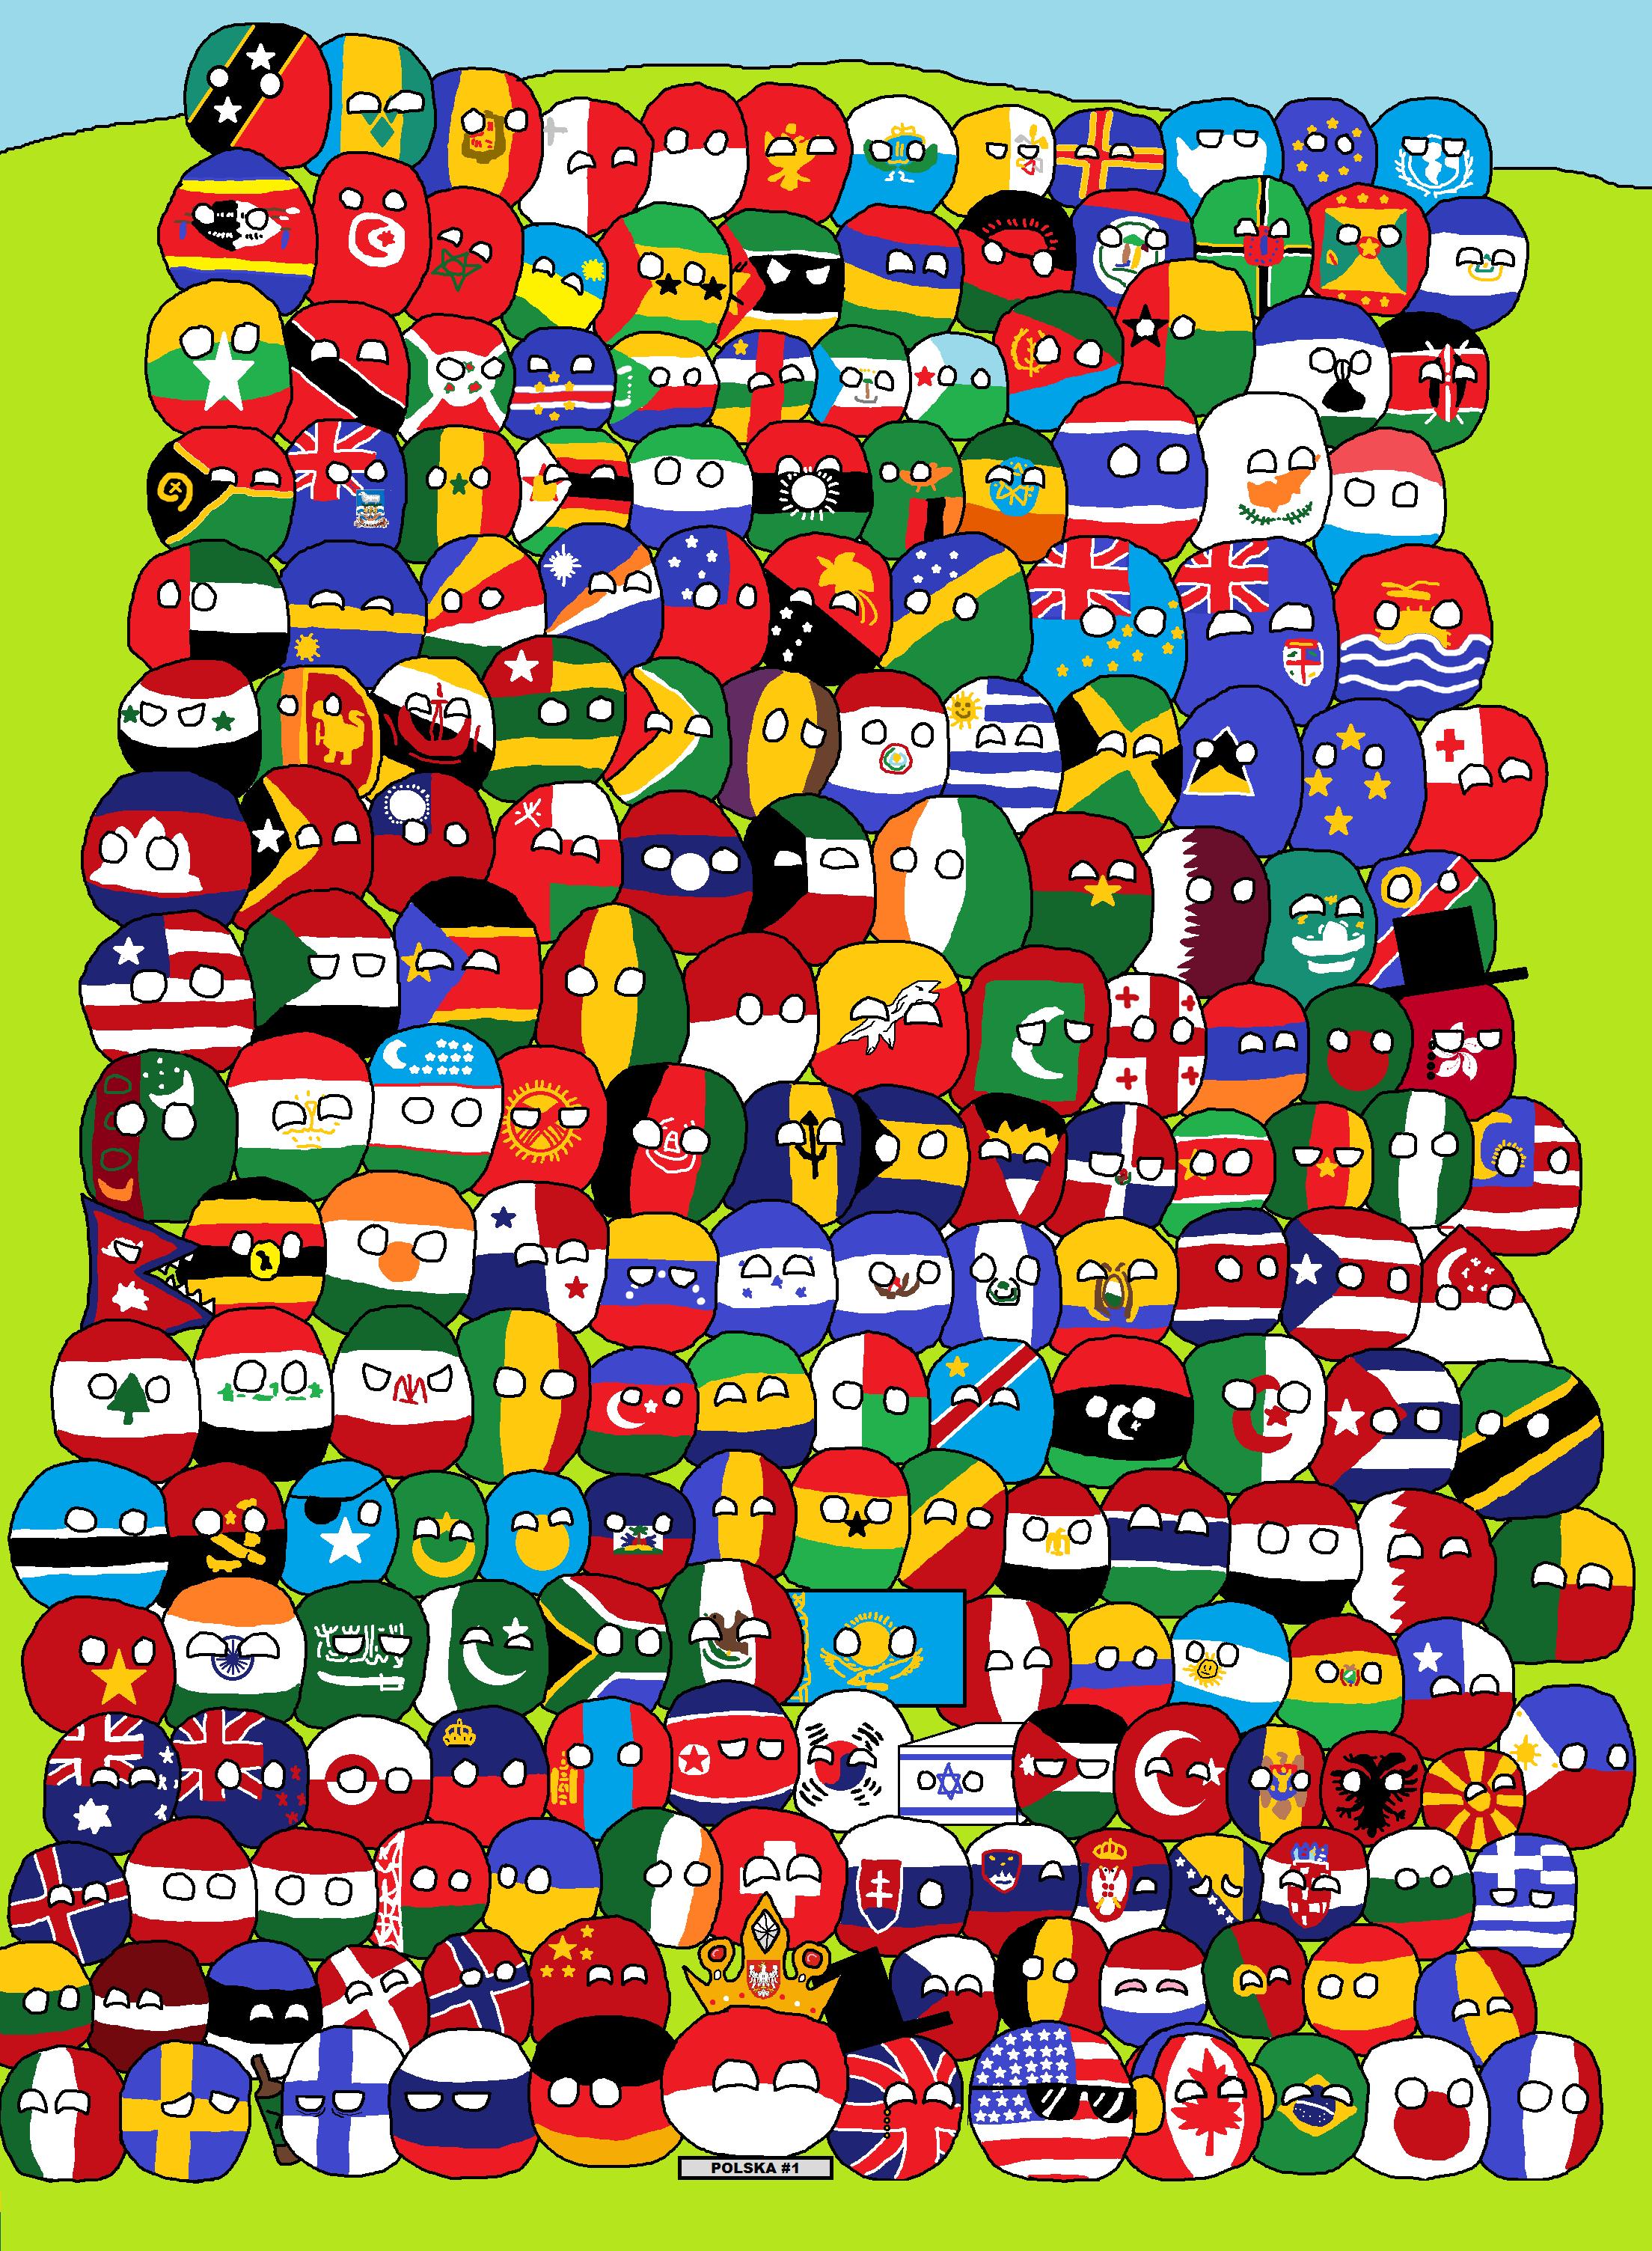 Filecountries of the world polandballg wikimedia commons filecountries of the world polandballg gumiabroncs Choice Image